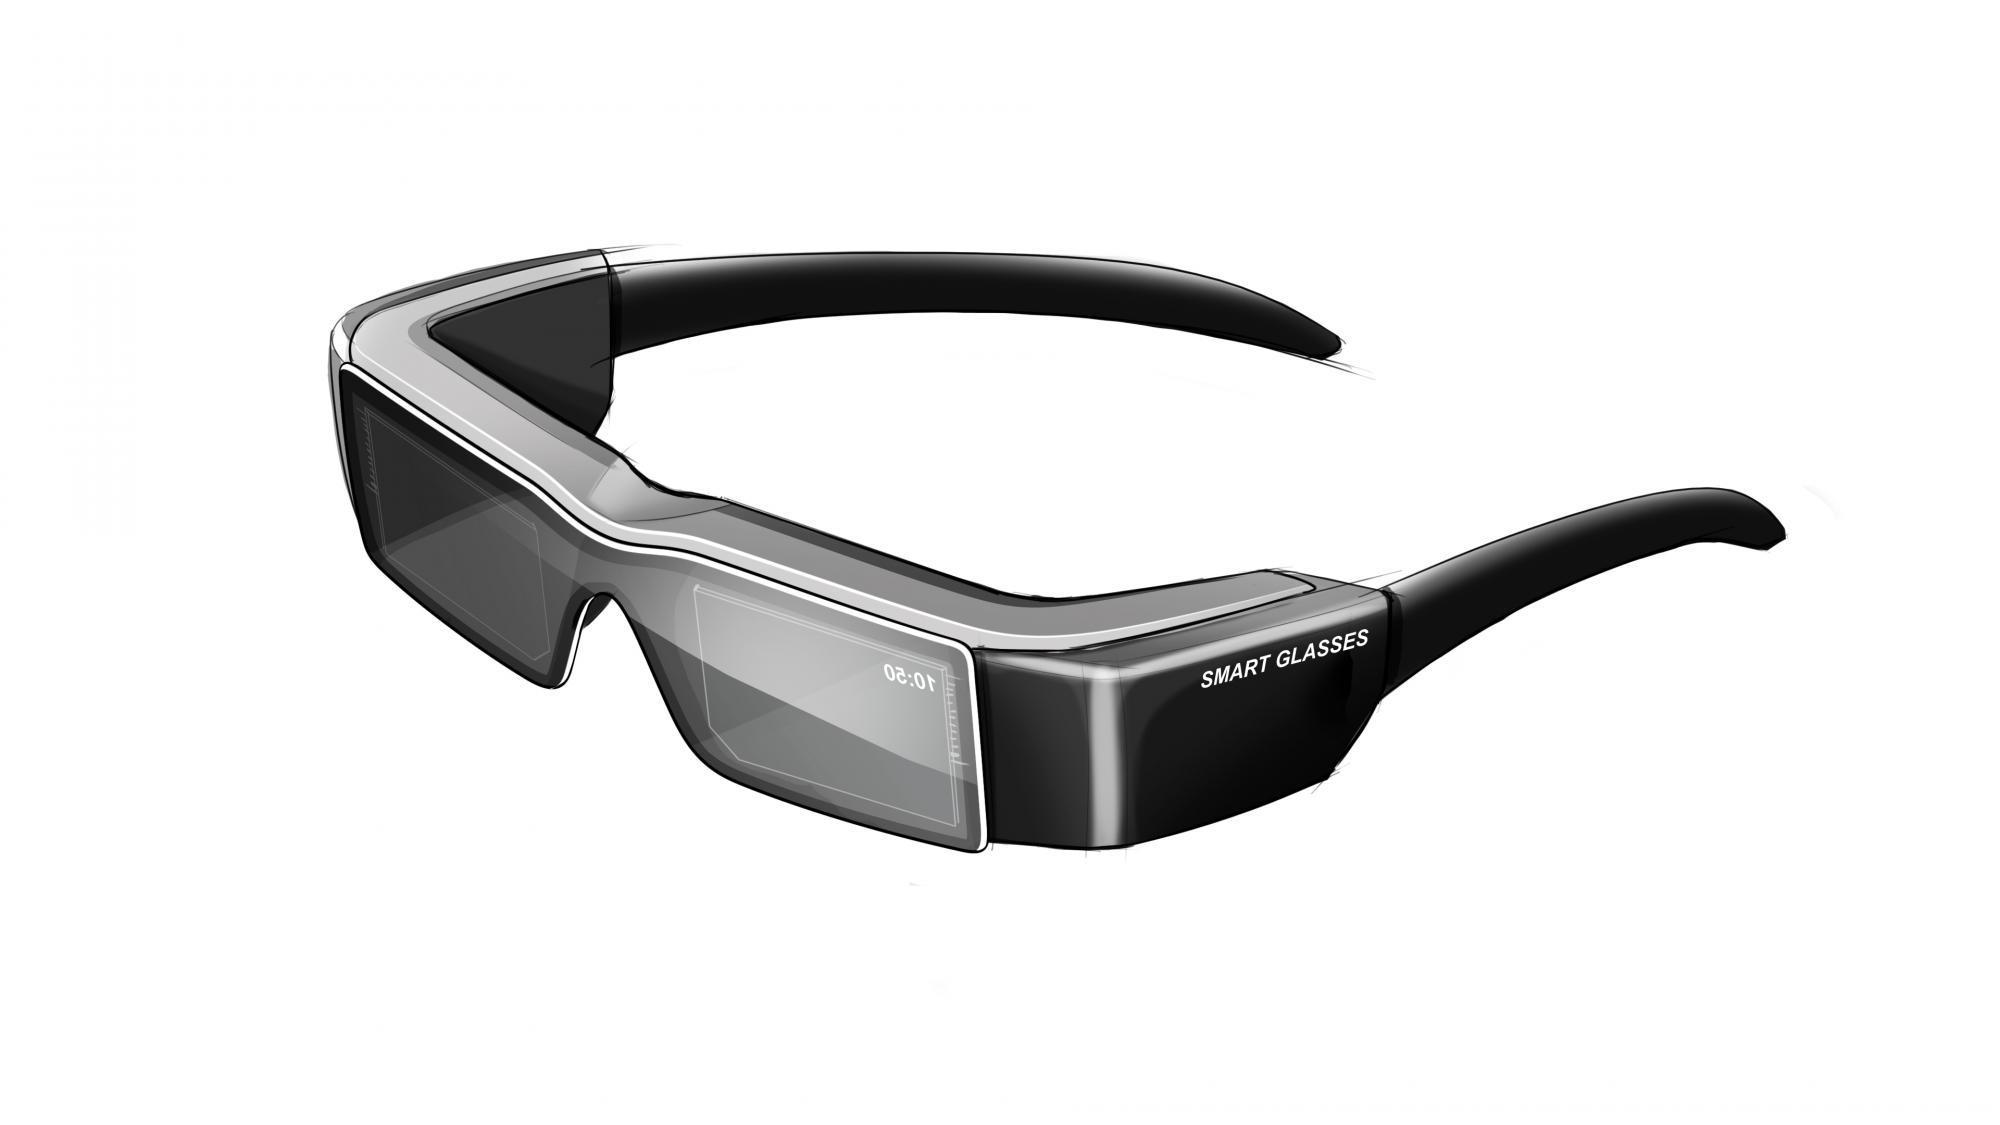 Hot Bar Bonding connections for smart glasses